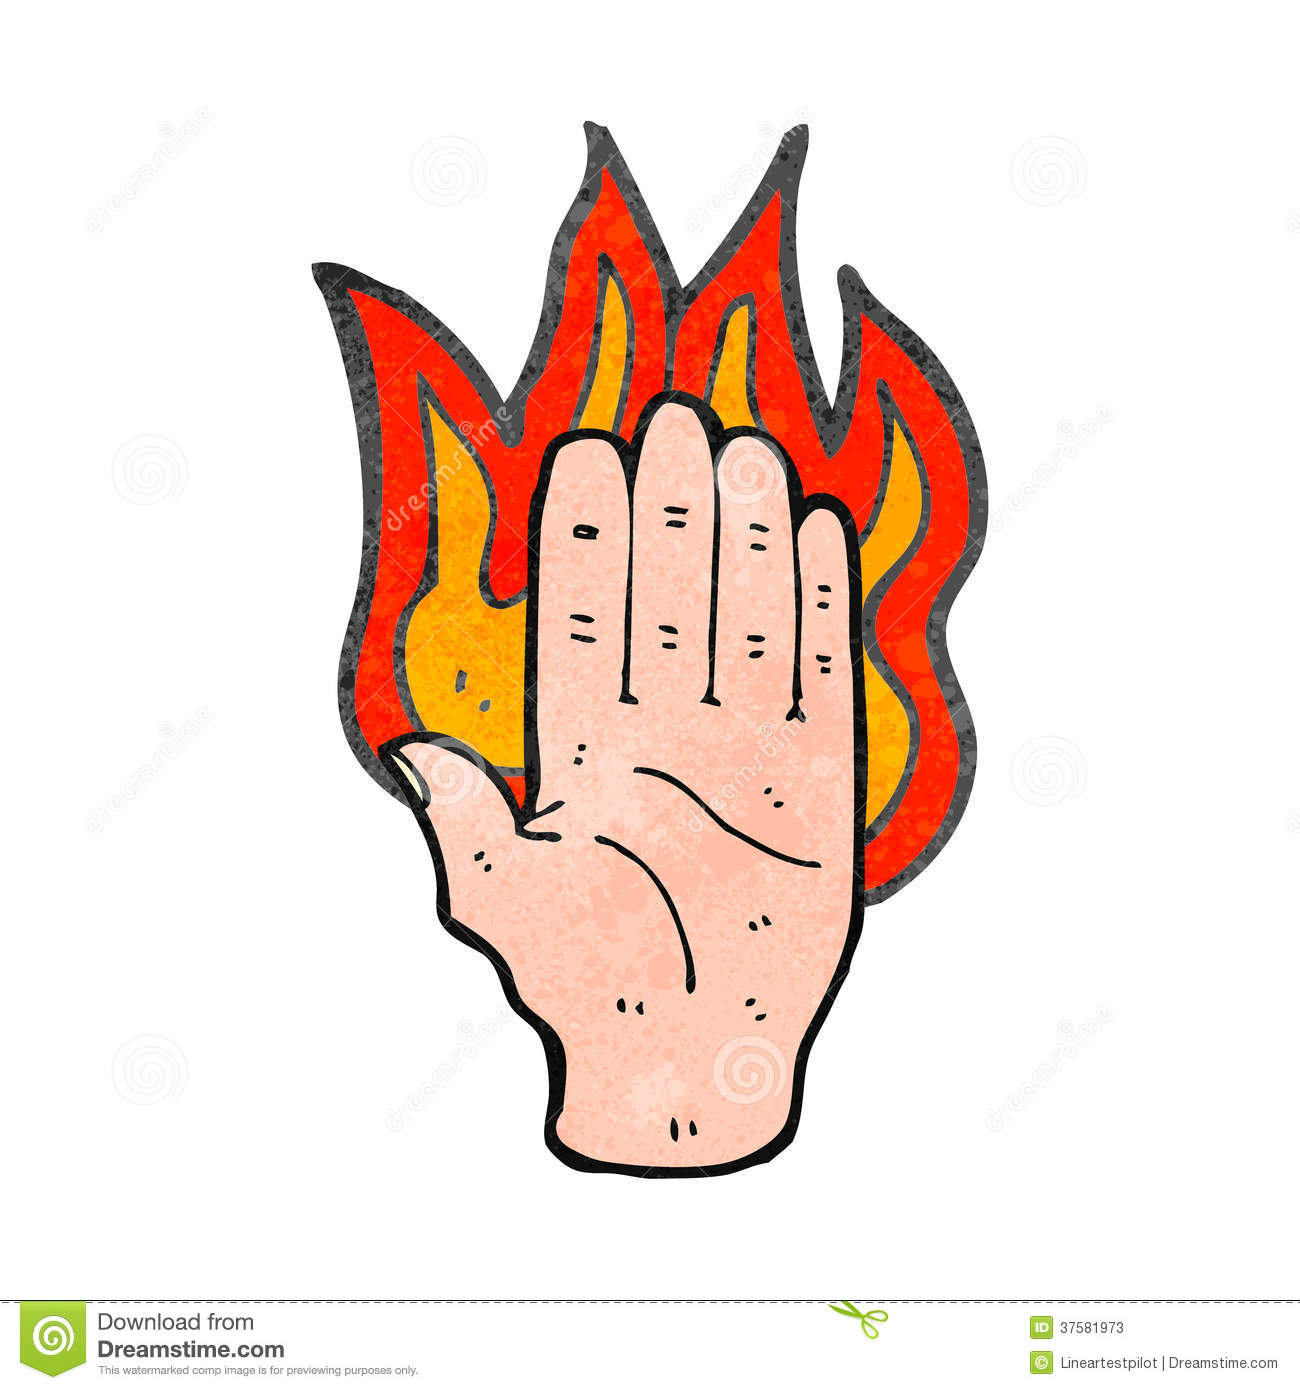 Retro cartoon burning hand stock vector. Illustration of texture.